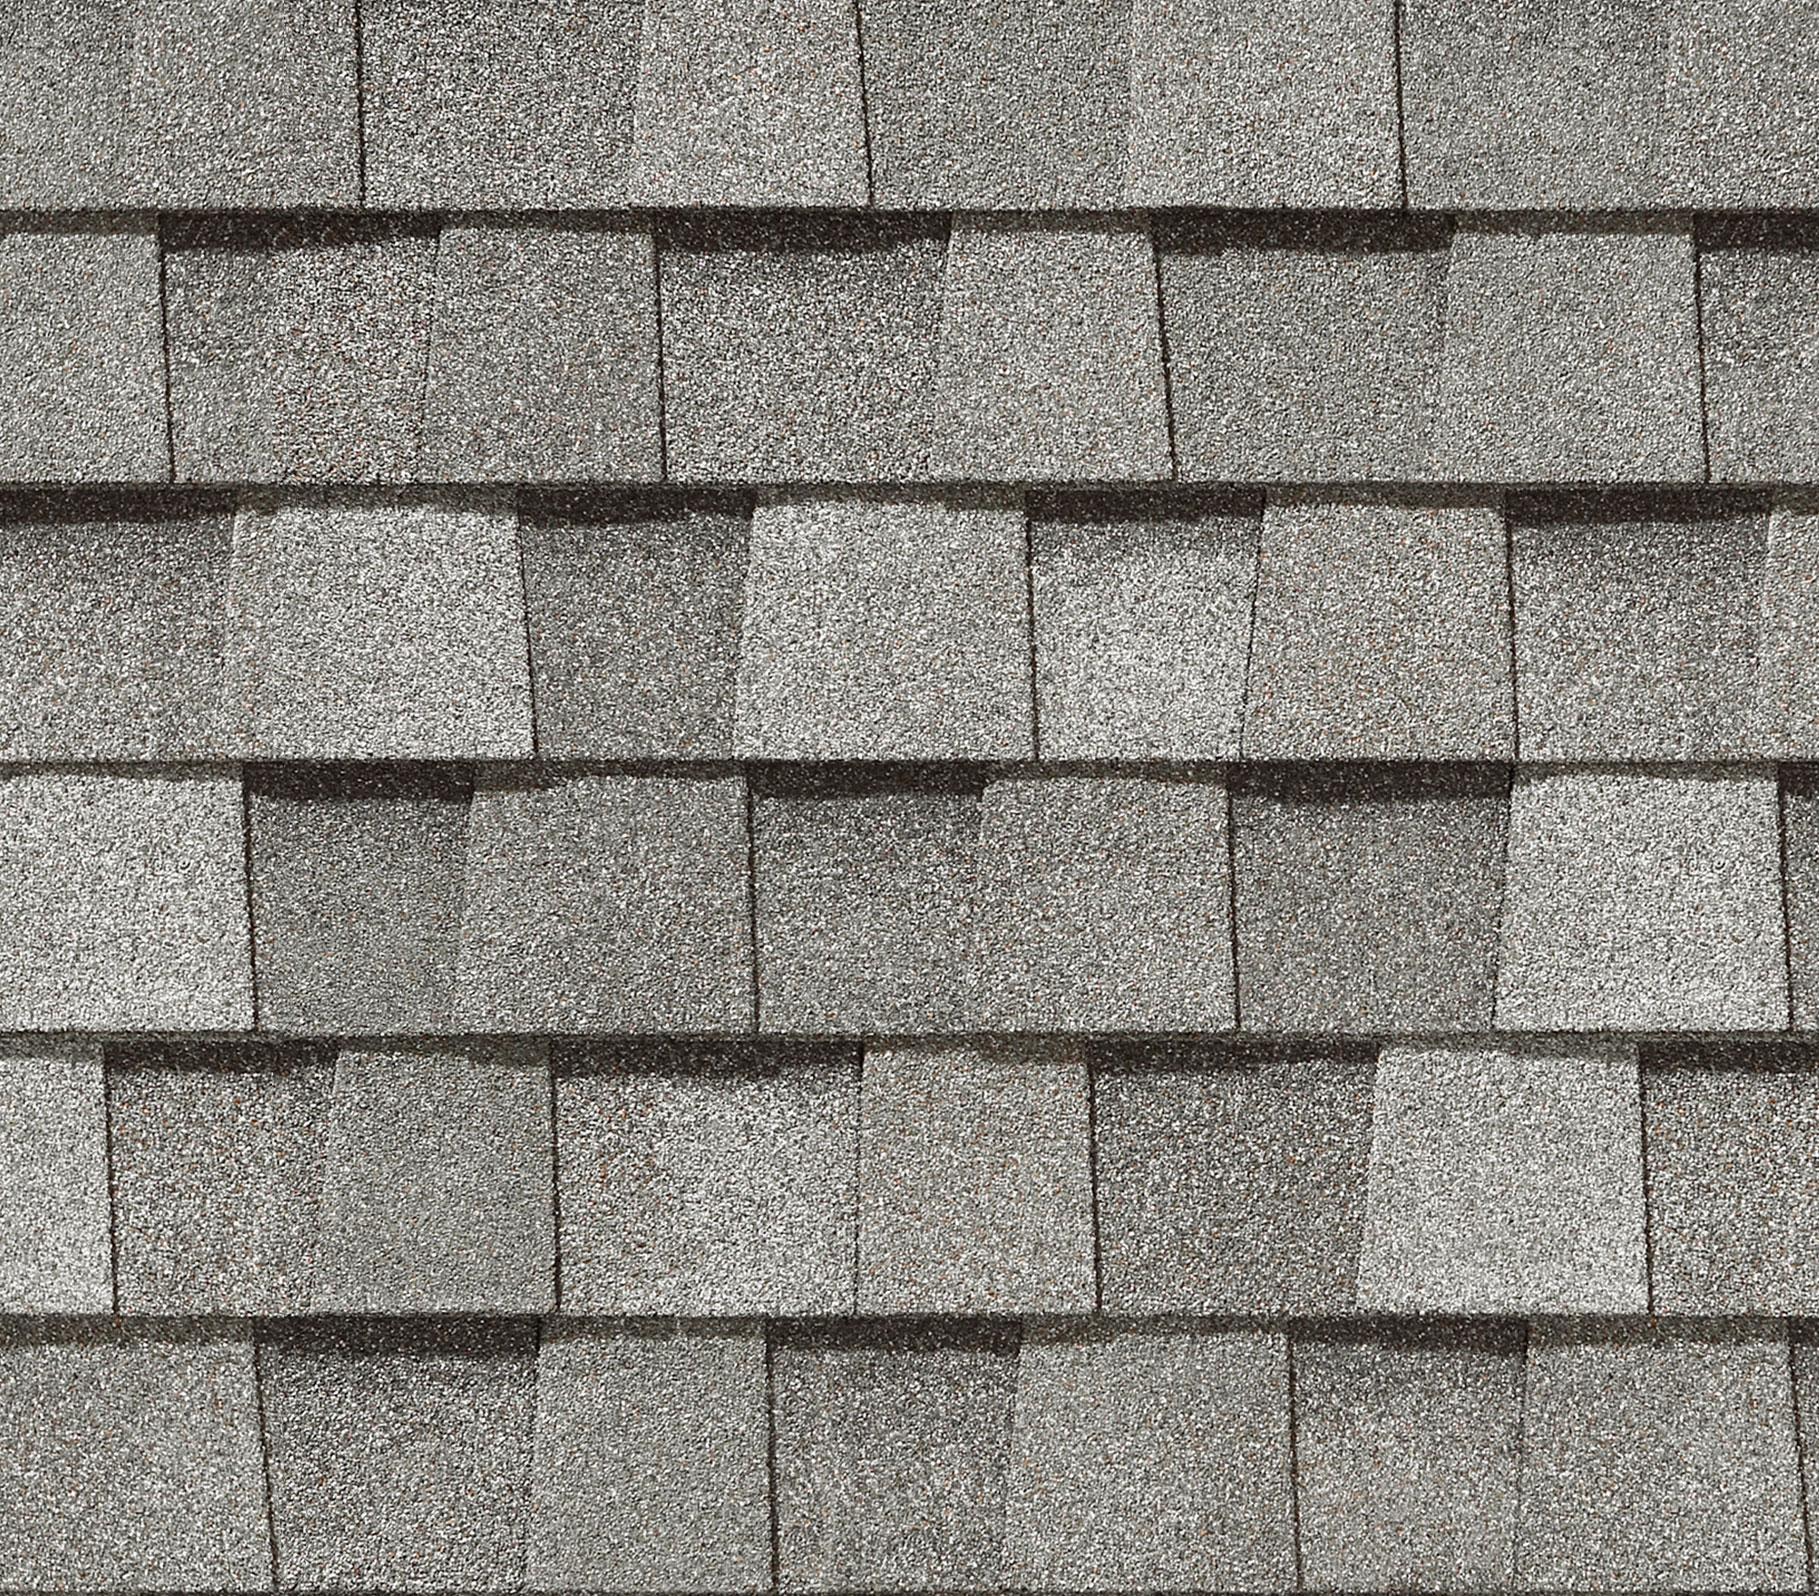 Kolor: Cobblestone Gray   Cena netto 43,90 zł za m²